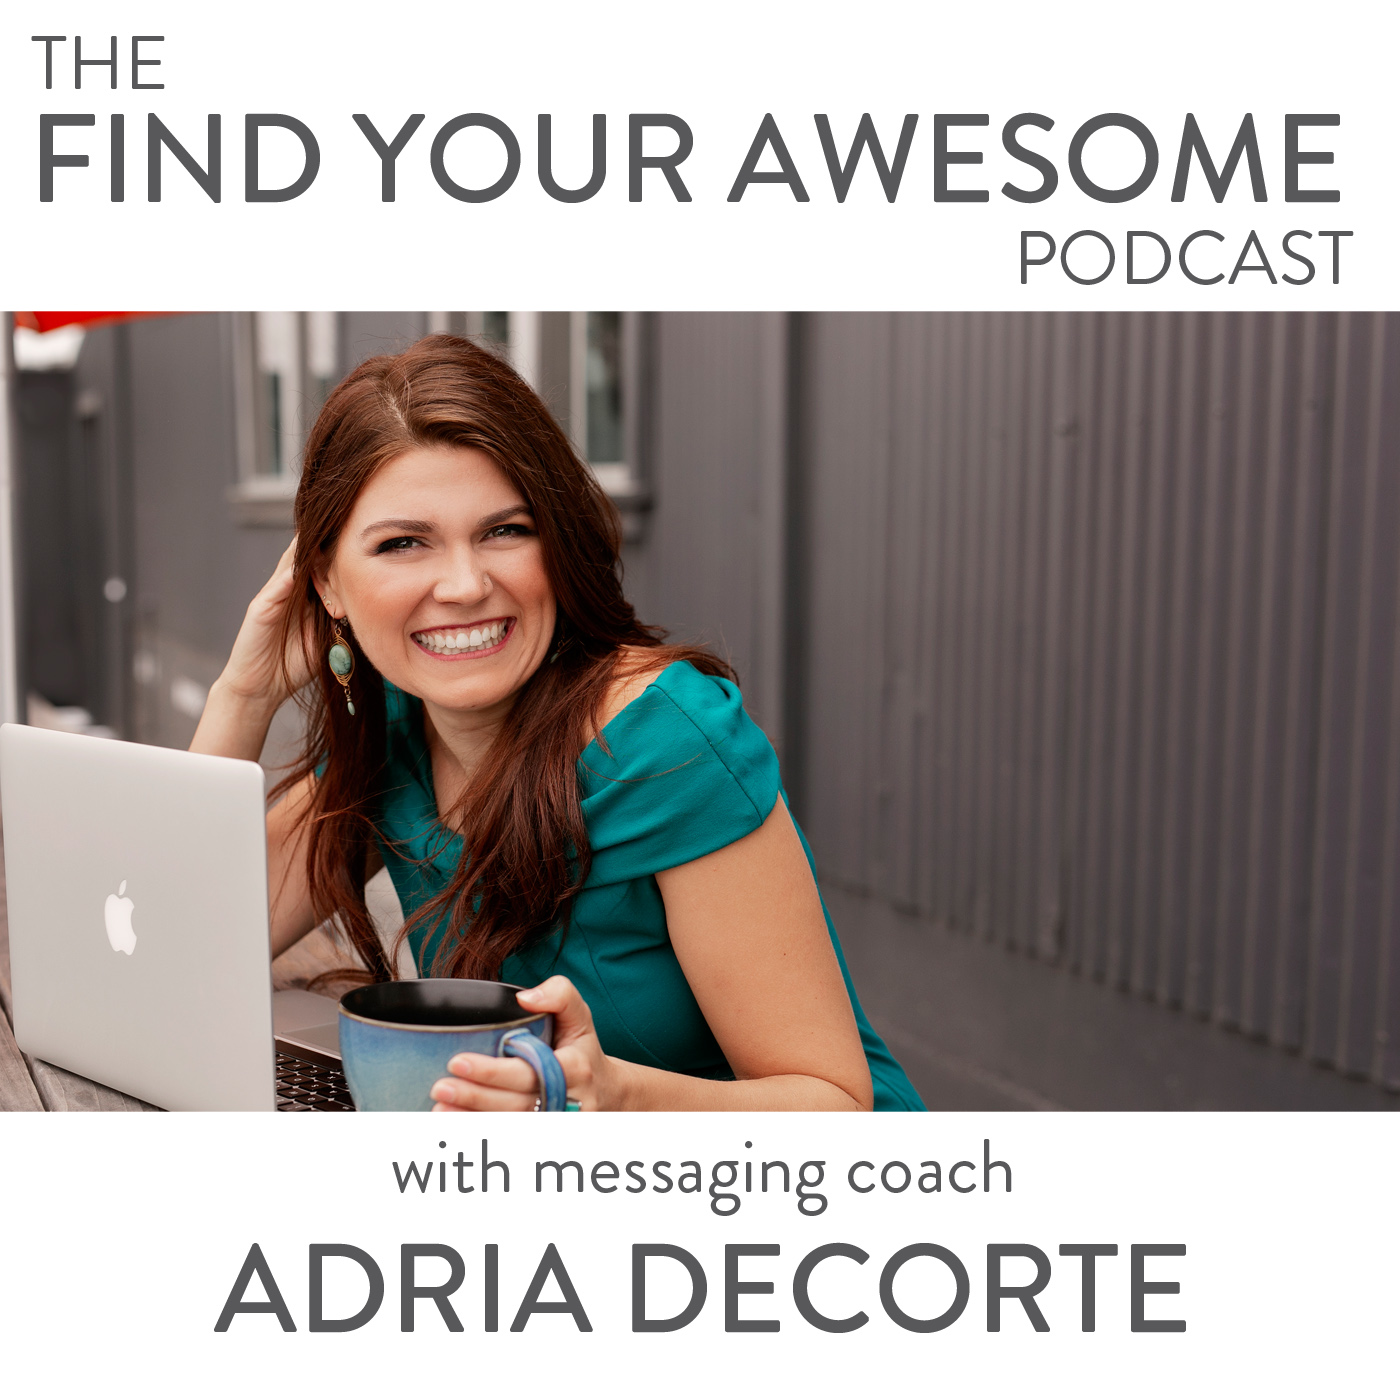 AdriaDecorte_podcast_coverart.jpg